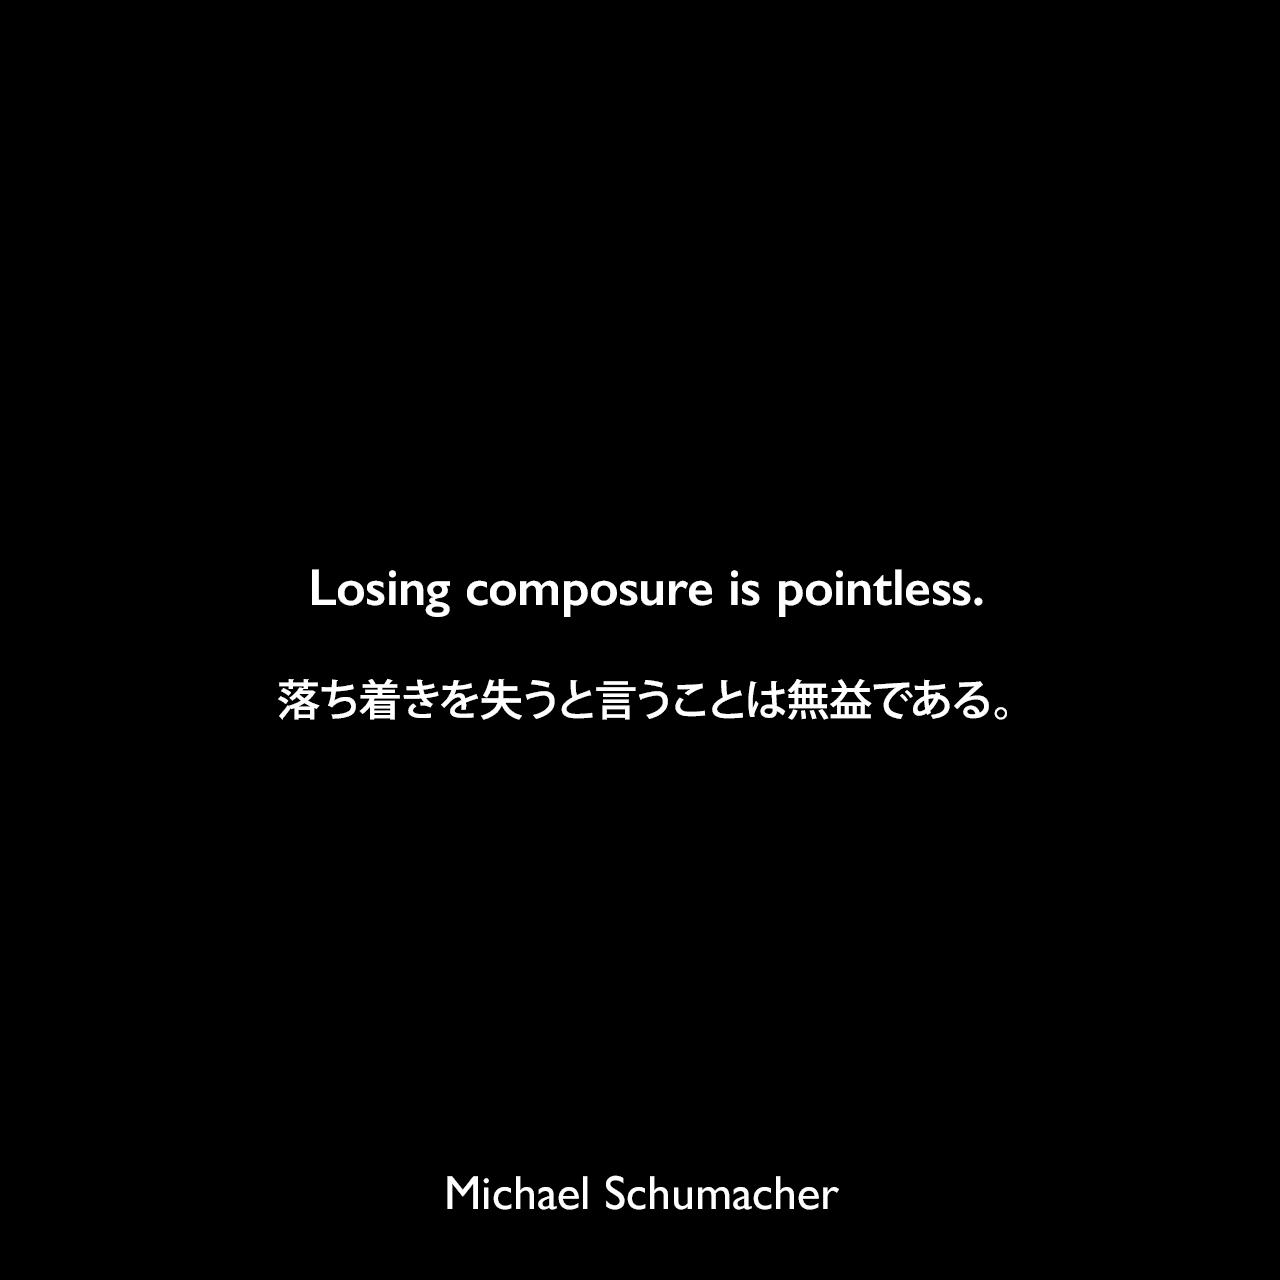 Losing composure is pointless.落ち着きを失うと言うことは無益である。Michael Schumacher